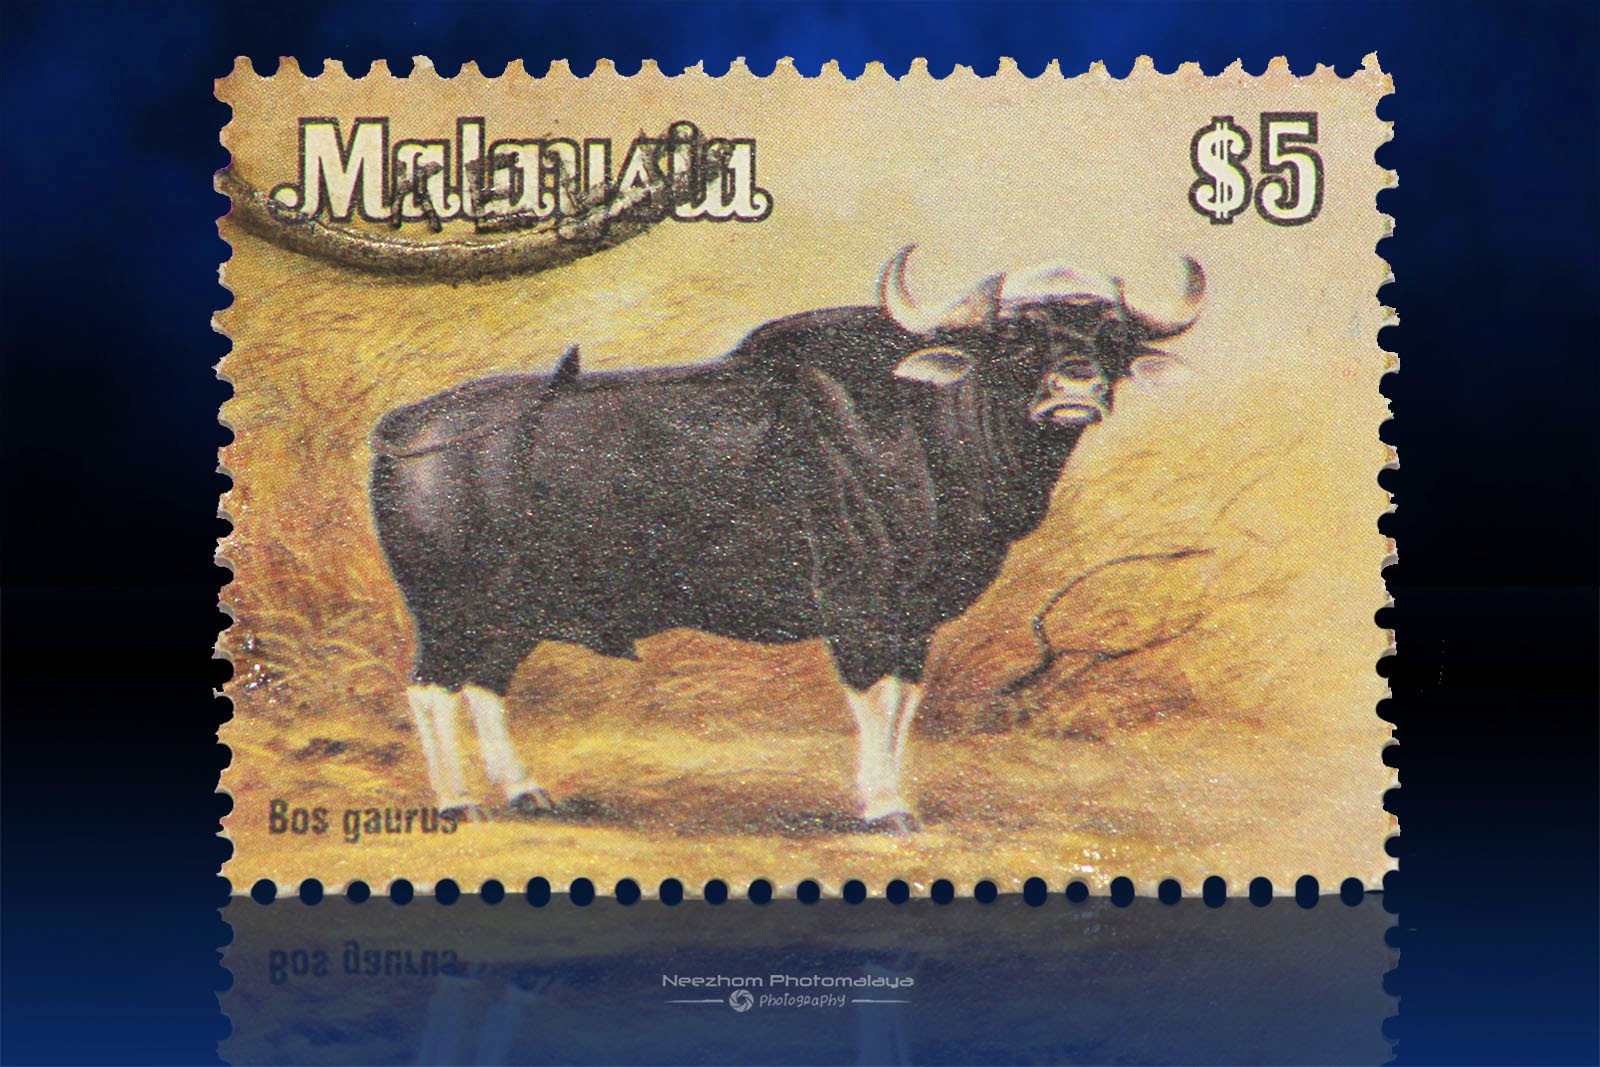 National Animals Series 1979 stamps - $5 Bos Gaurus